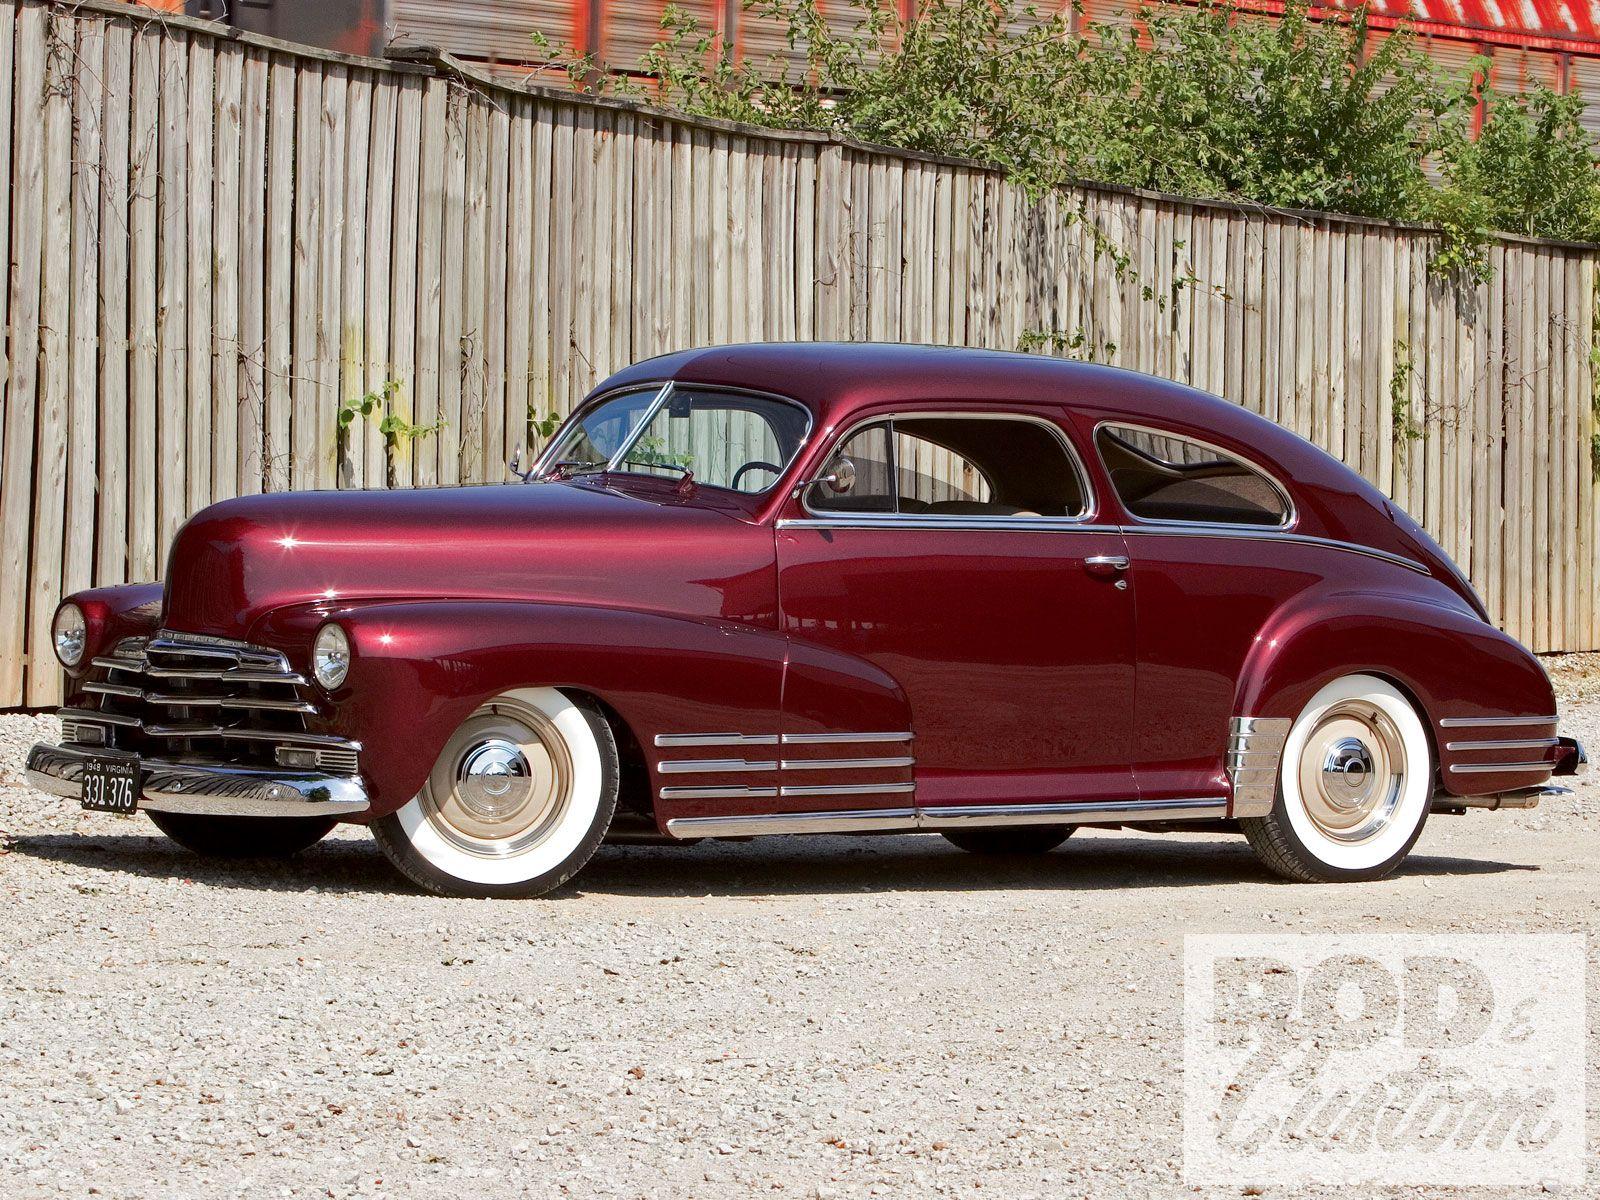 1948 Chevrolet Fleetline Aero It S Surprising What The Right